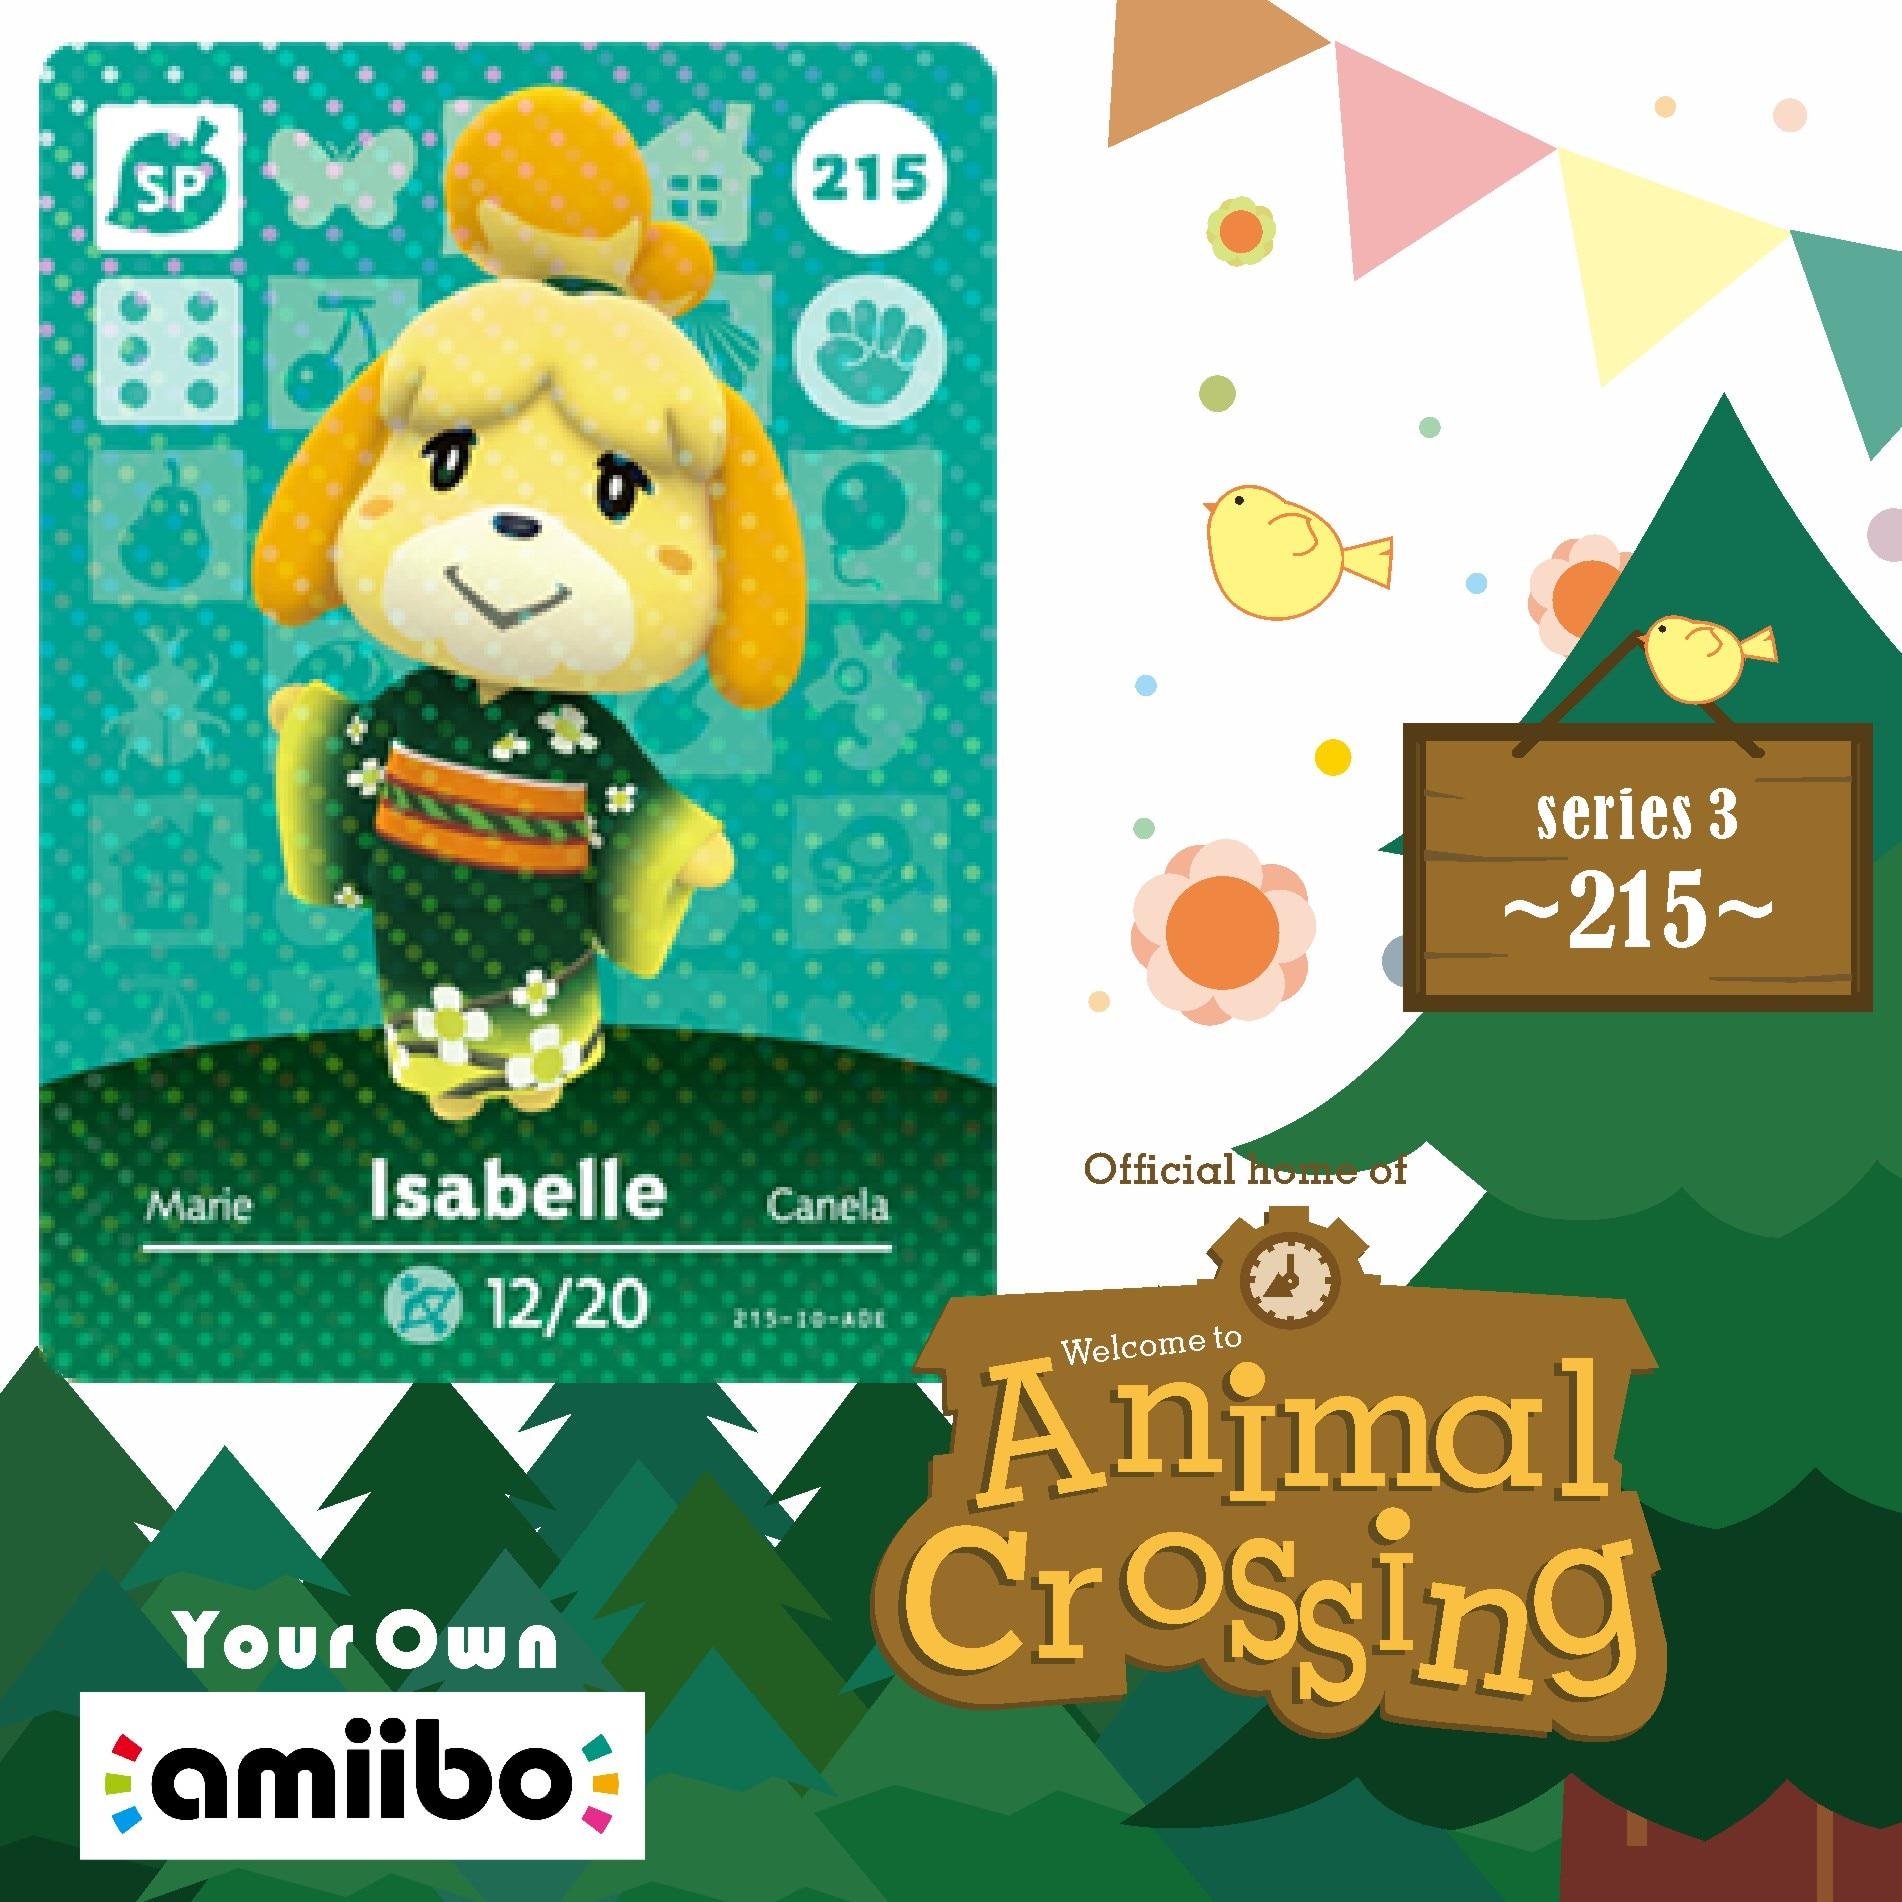 Welcome Amiibo Card Cards Animal Crossing Isabelle Isabel Animal Crossing Amiibo Card Series 1 Amino Cards For Animal Crossing